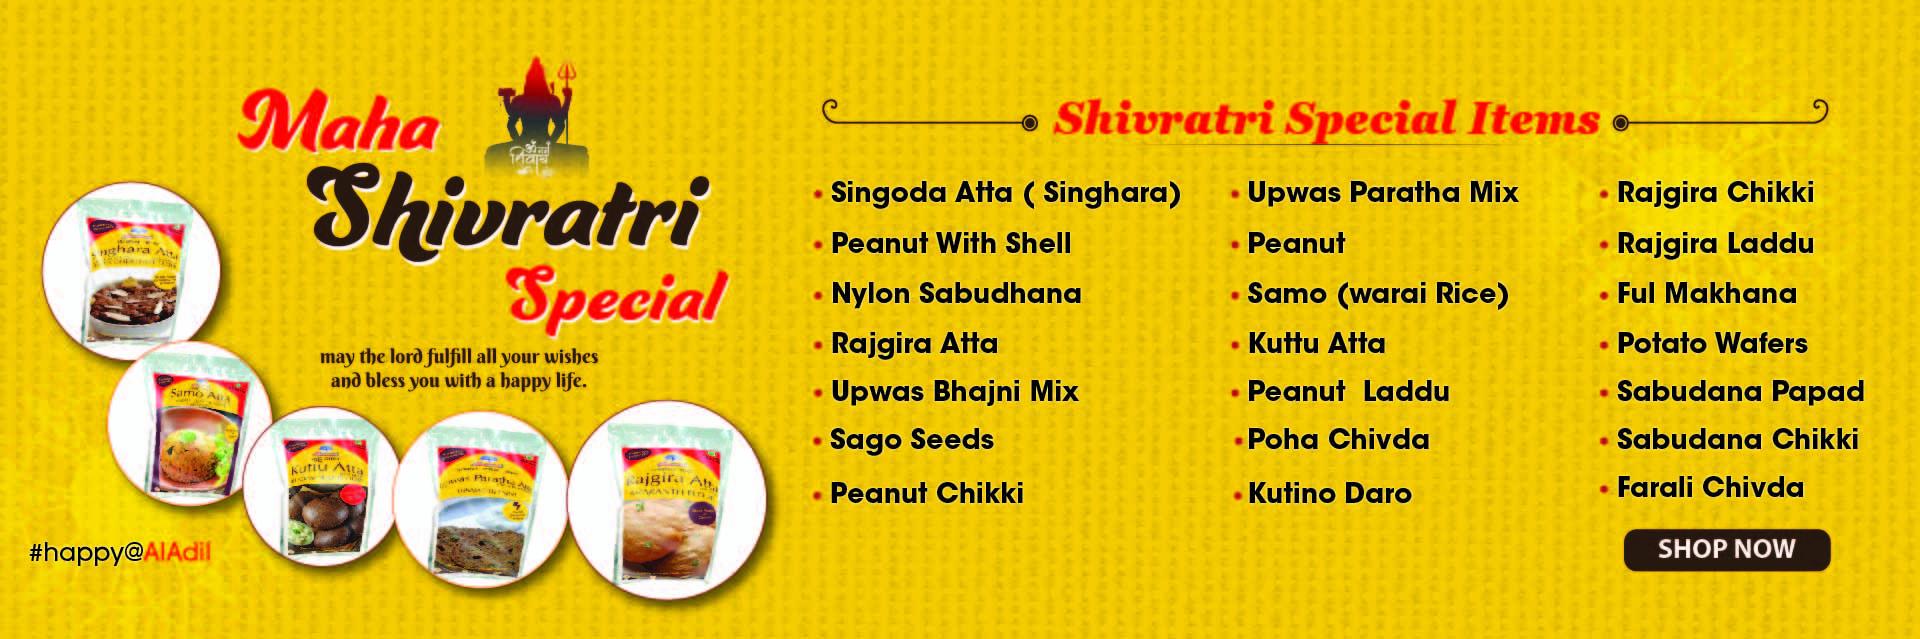 Shivratri promotional